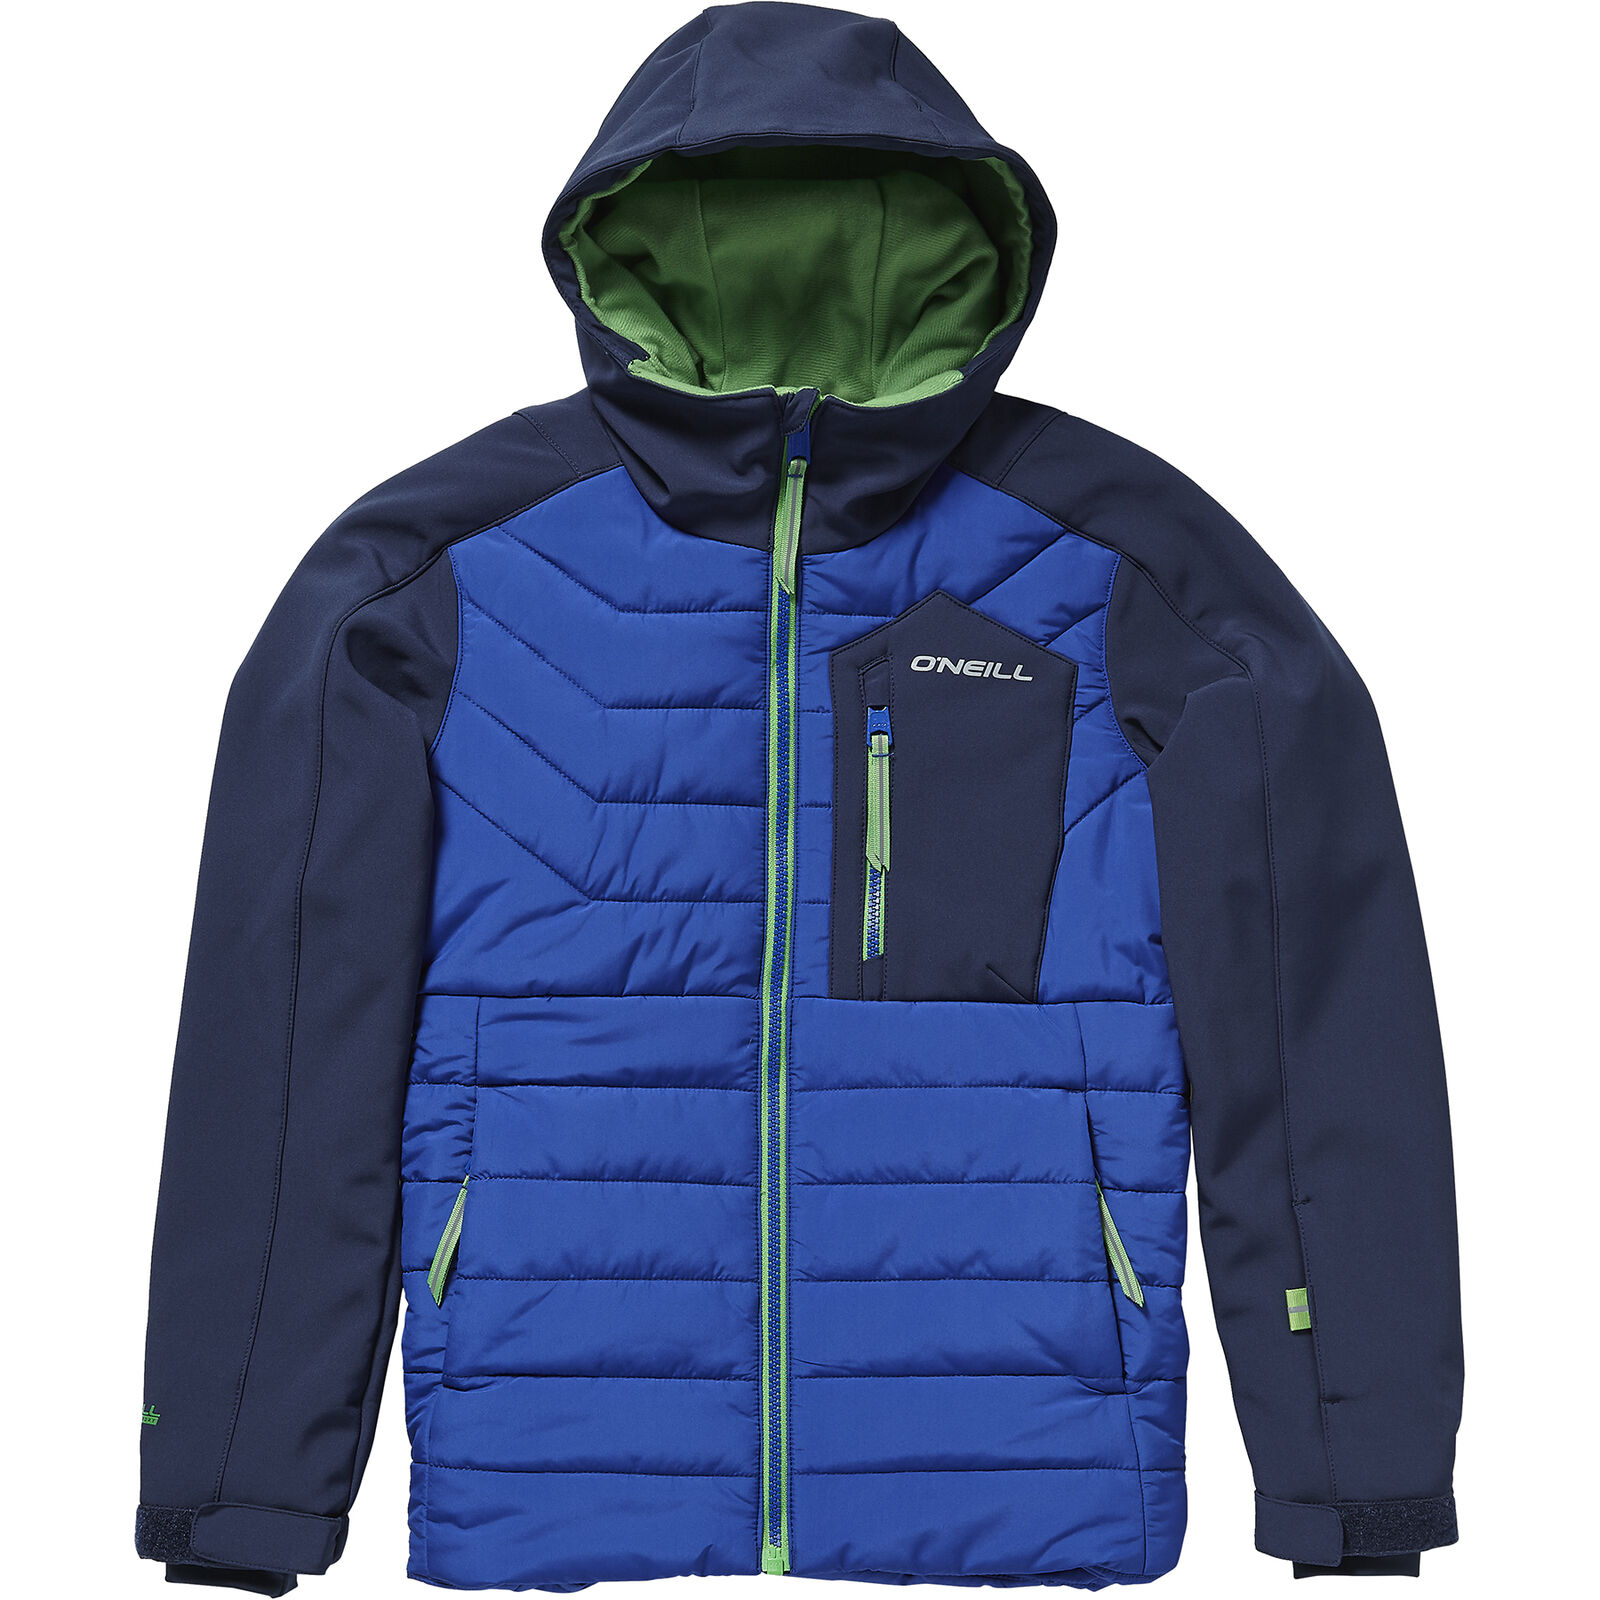 O'Neill Chaqueta Esquí Snowboard Pb 37-n Chaqueta  blue Impermeable  in stadium promotions